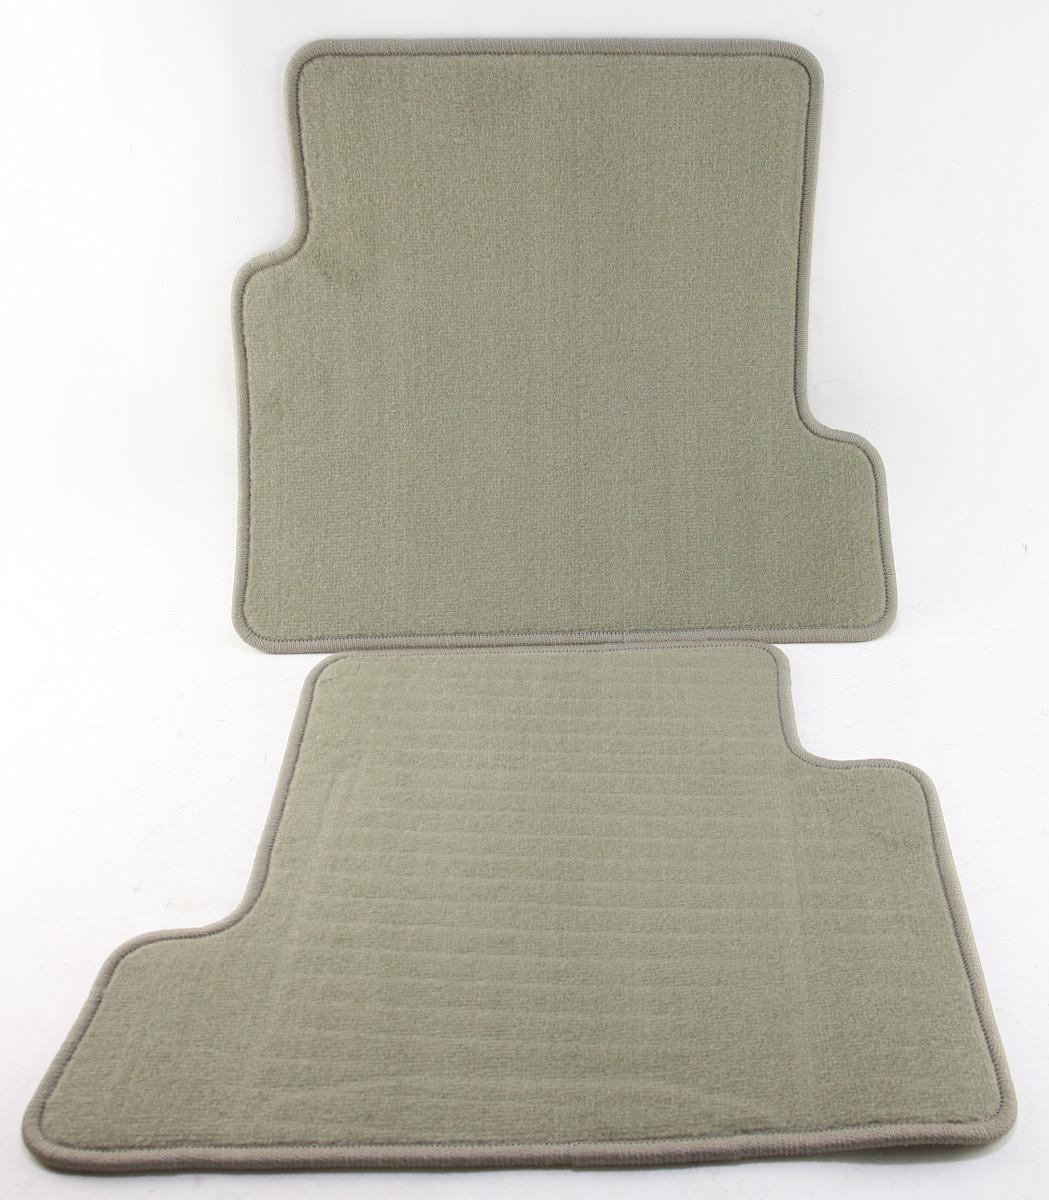 ***~ New OEM Ford CJ5Z7813106AA 13-16 Escape Carpet Rear Mats Medium Light Stone - image 6